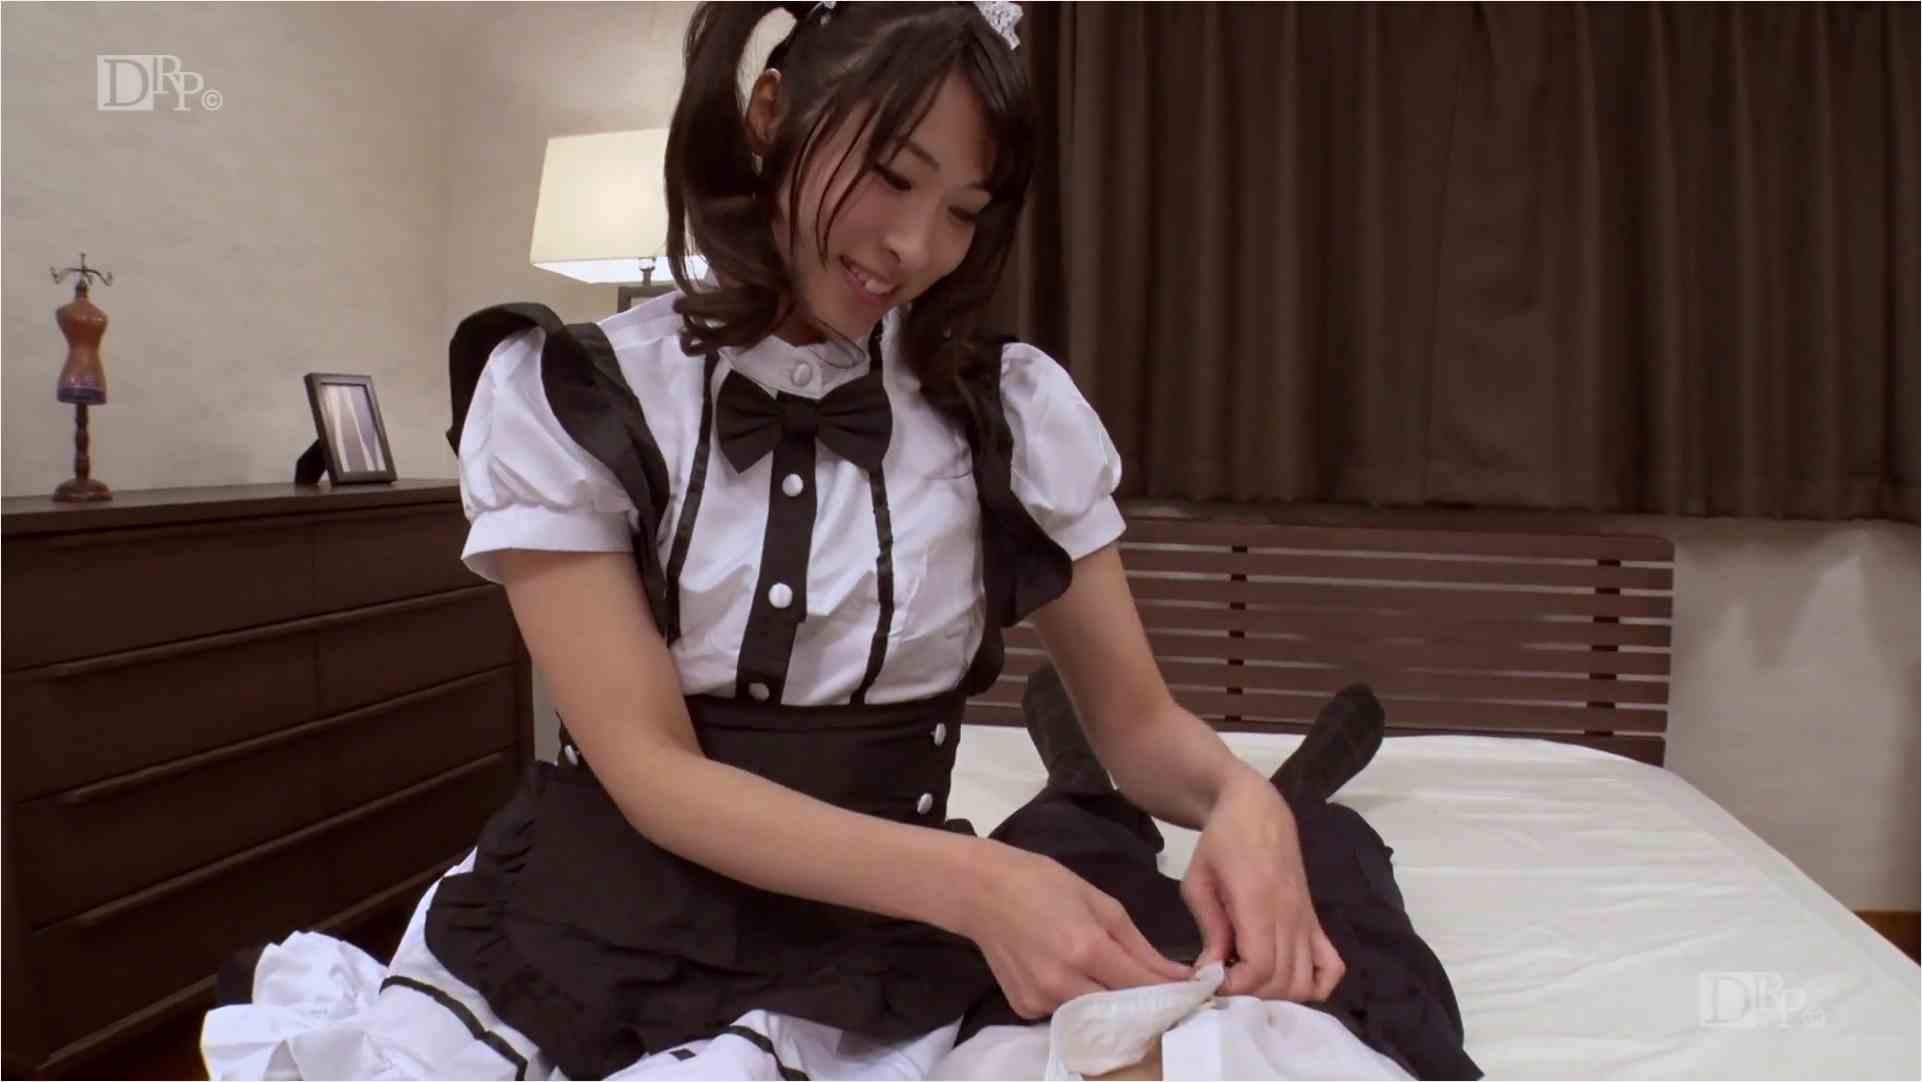 Heyzo-1613-メイどーる Vol.10~ご主人様のいいなり性人形~